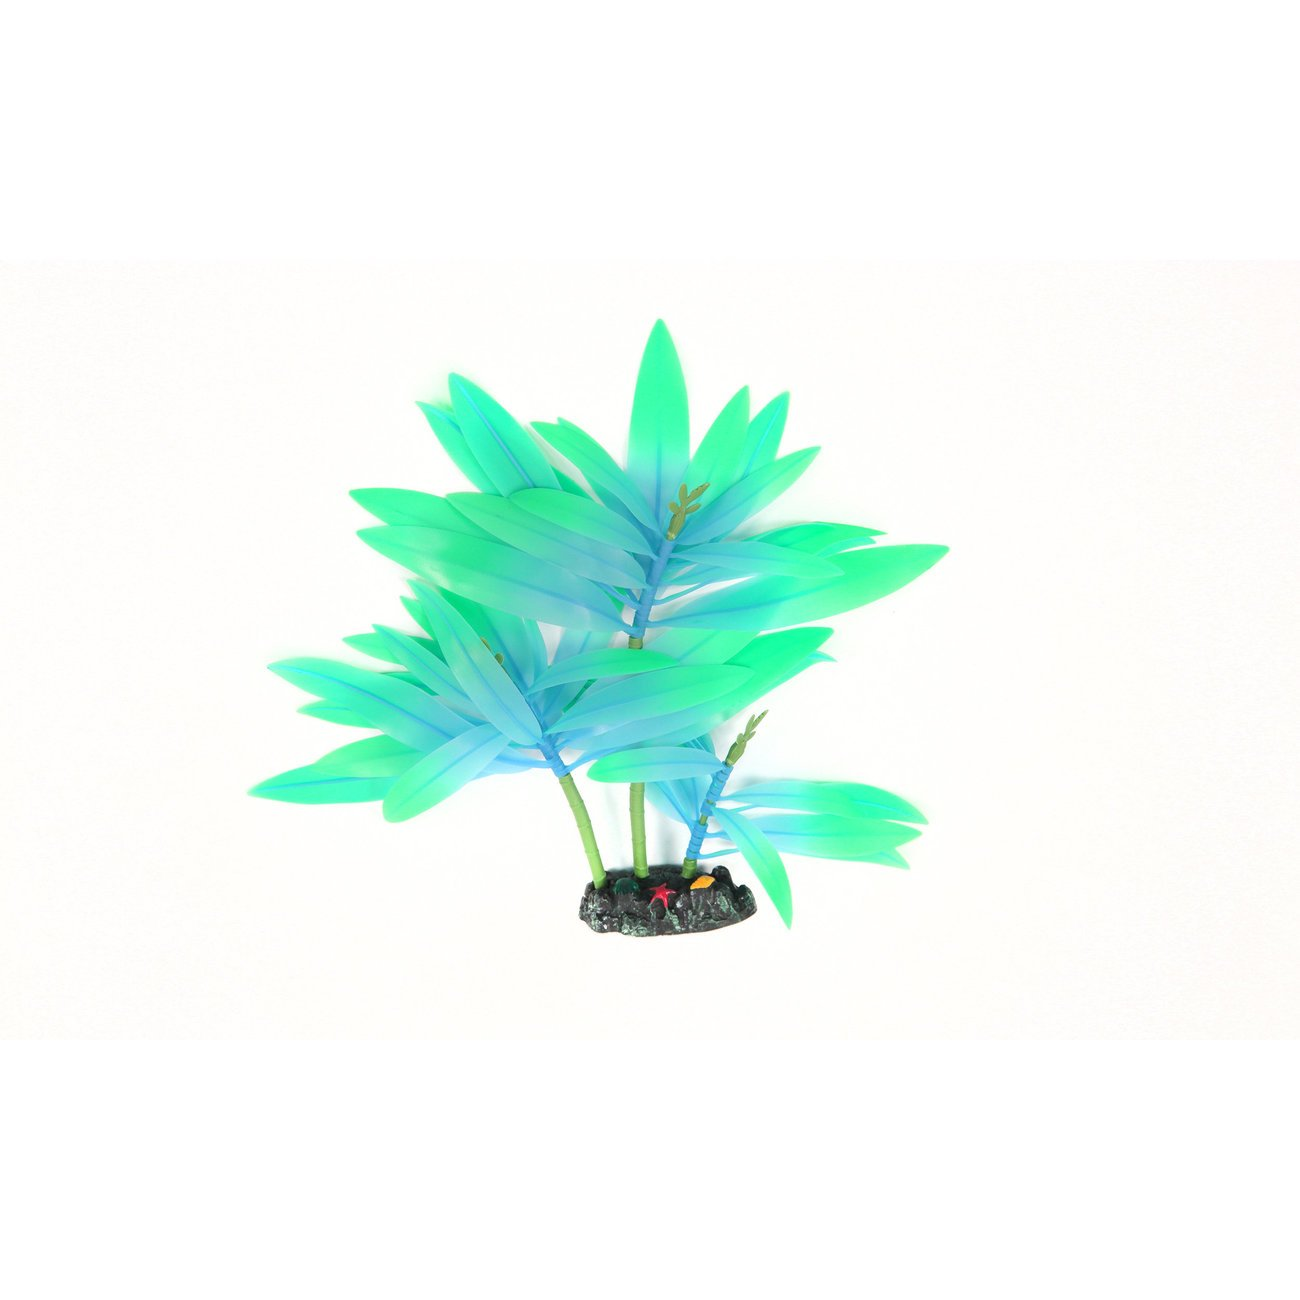 Aquatlantis Aqua Glow Schattenbaum, Bild 2